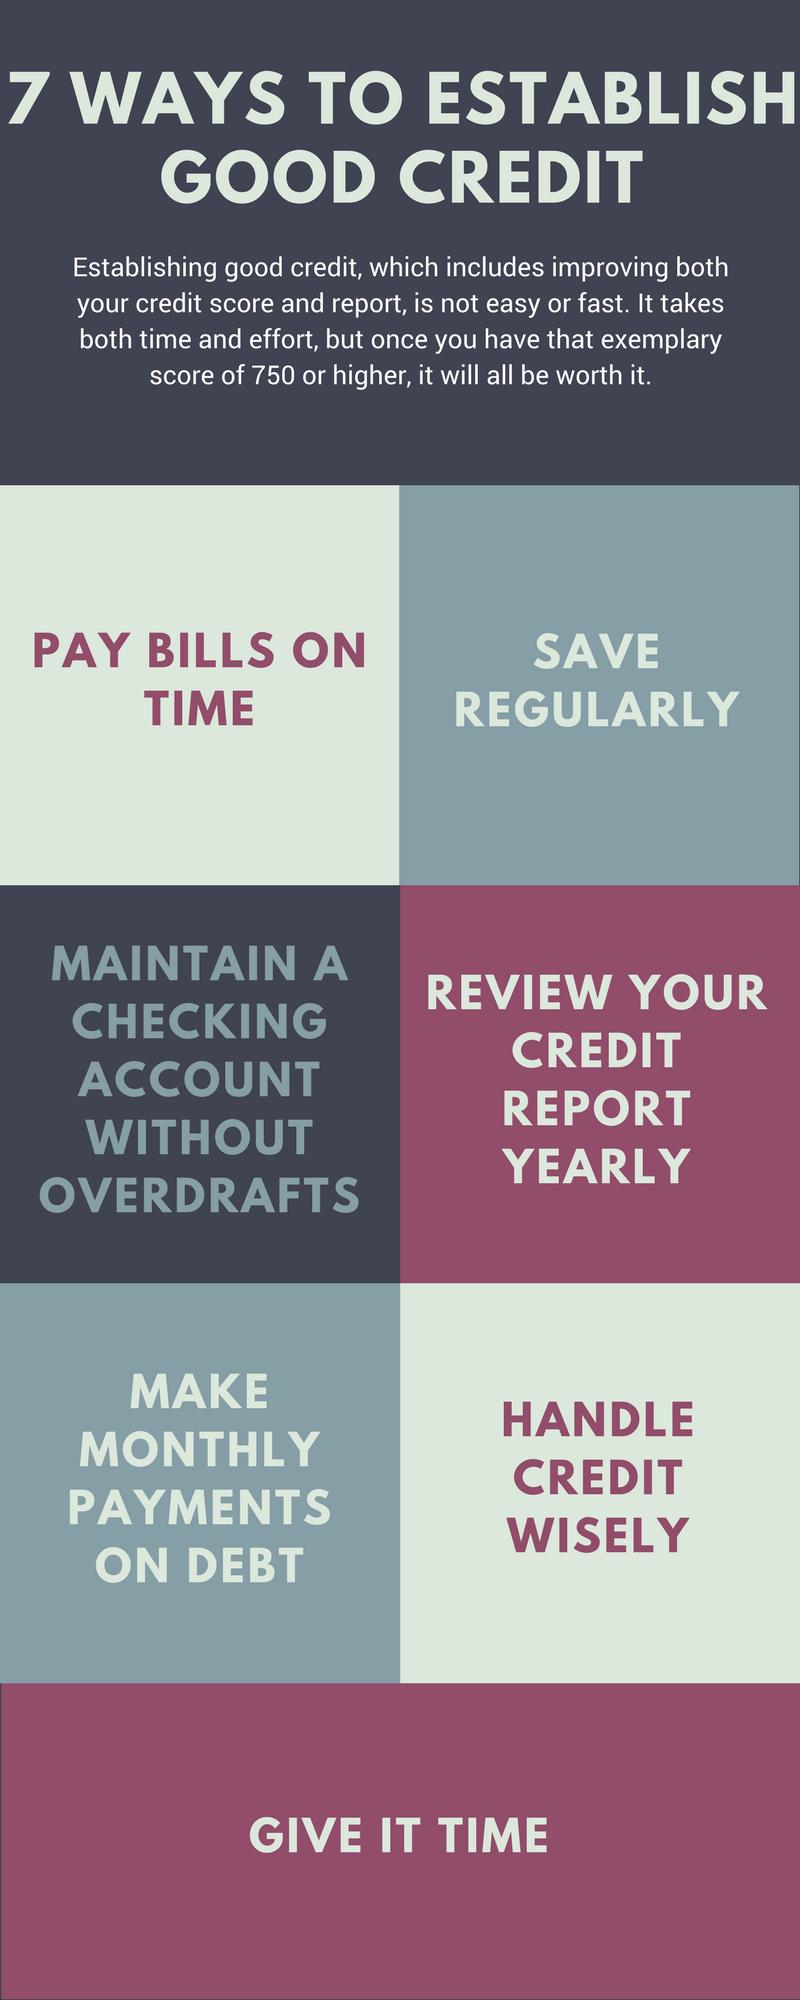 7 ways to establish good credit infographic.png